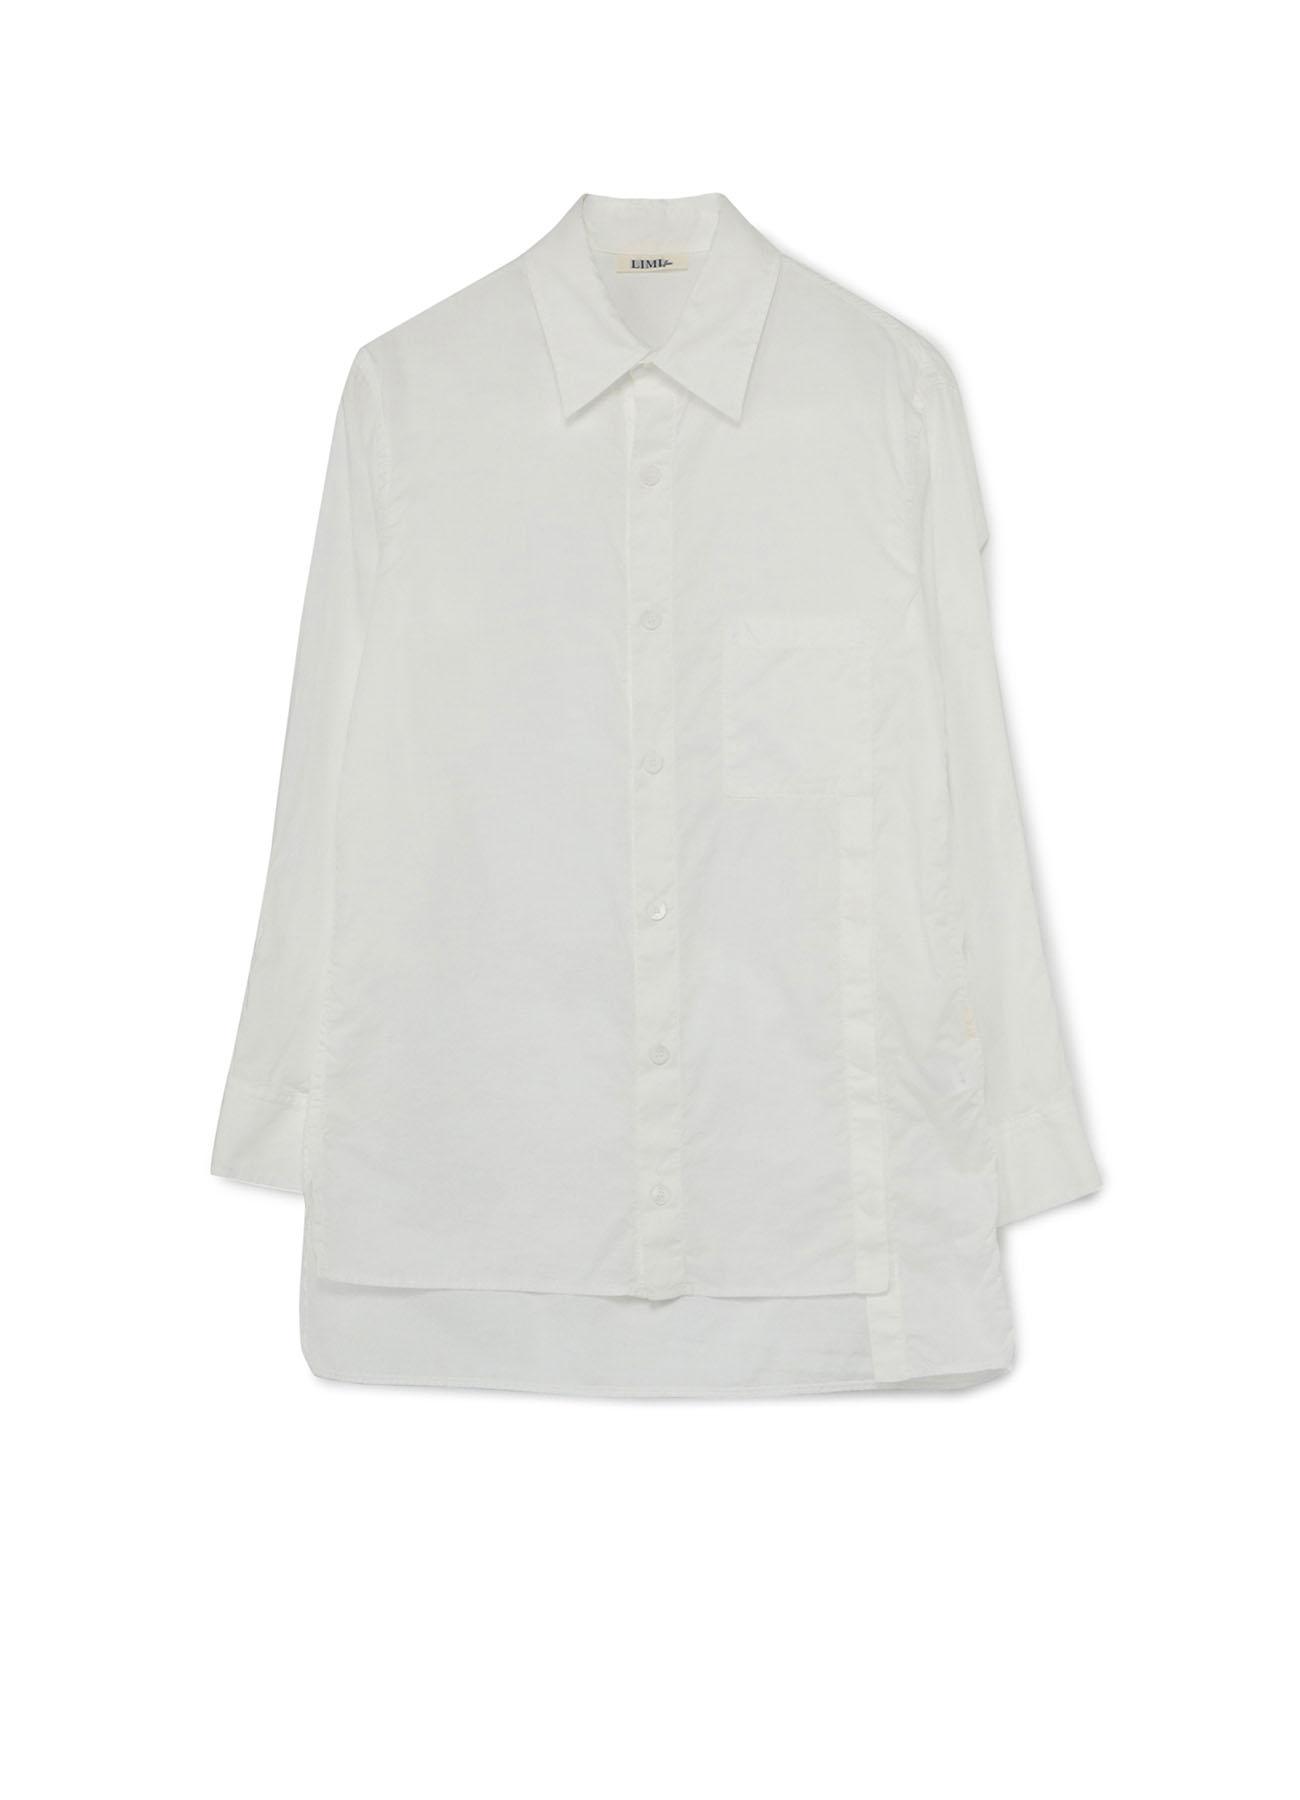 Compackt Viyella Left Open Placket Shirt